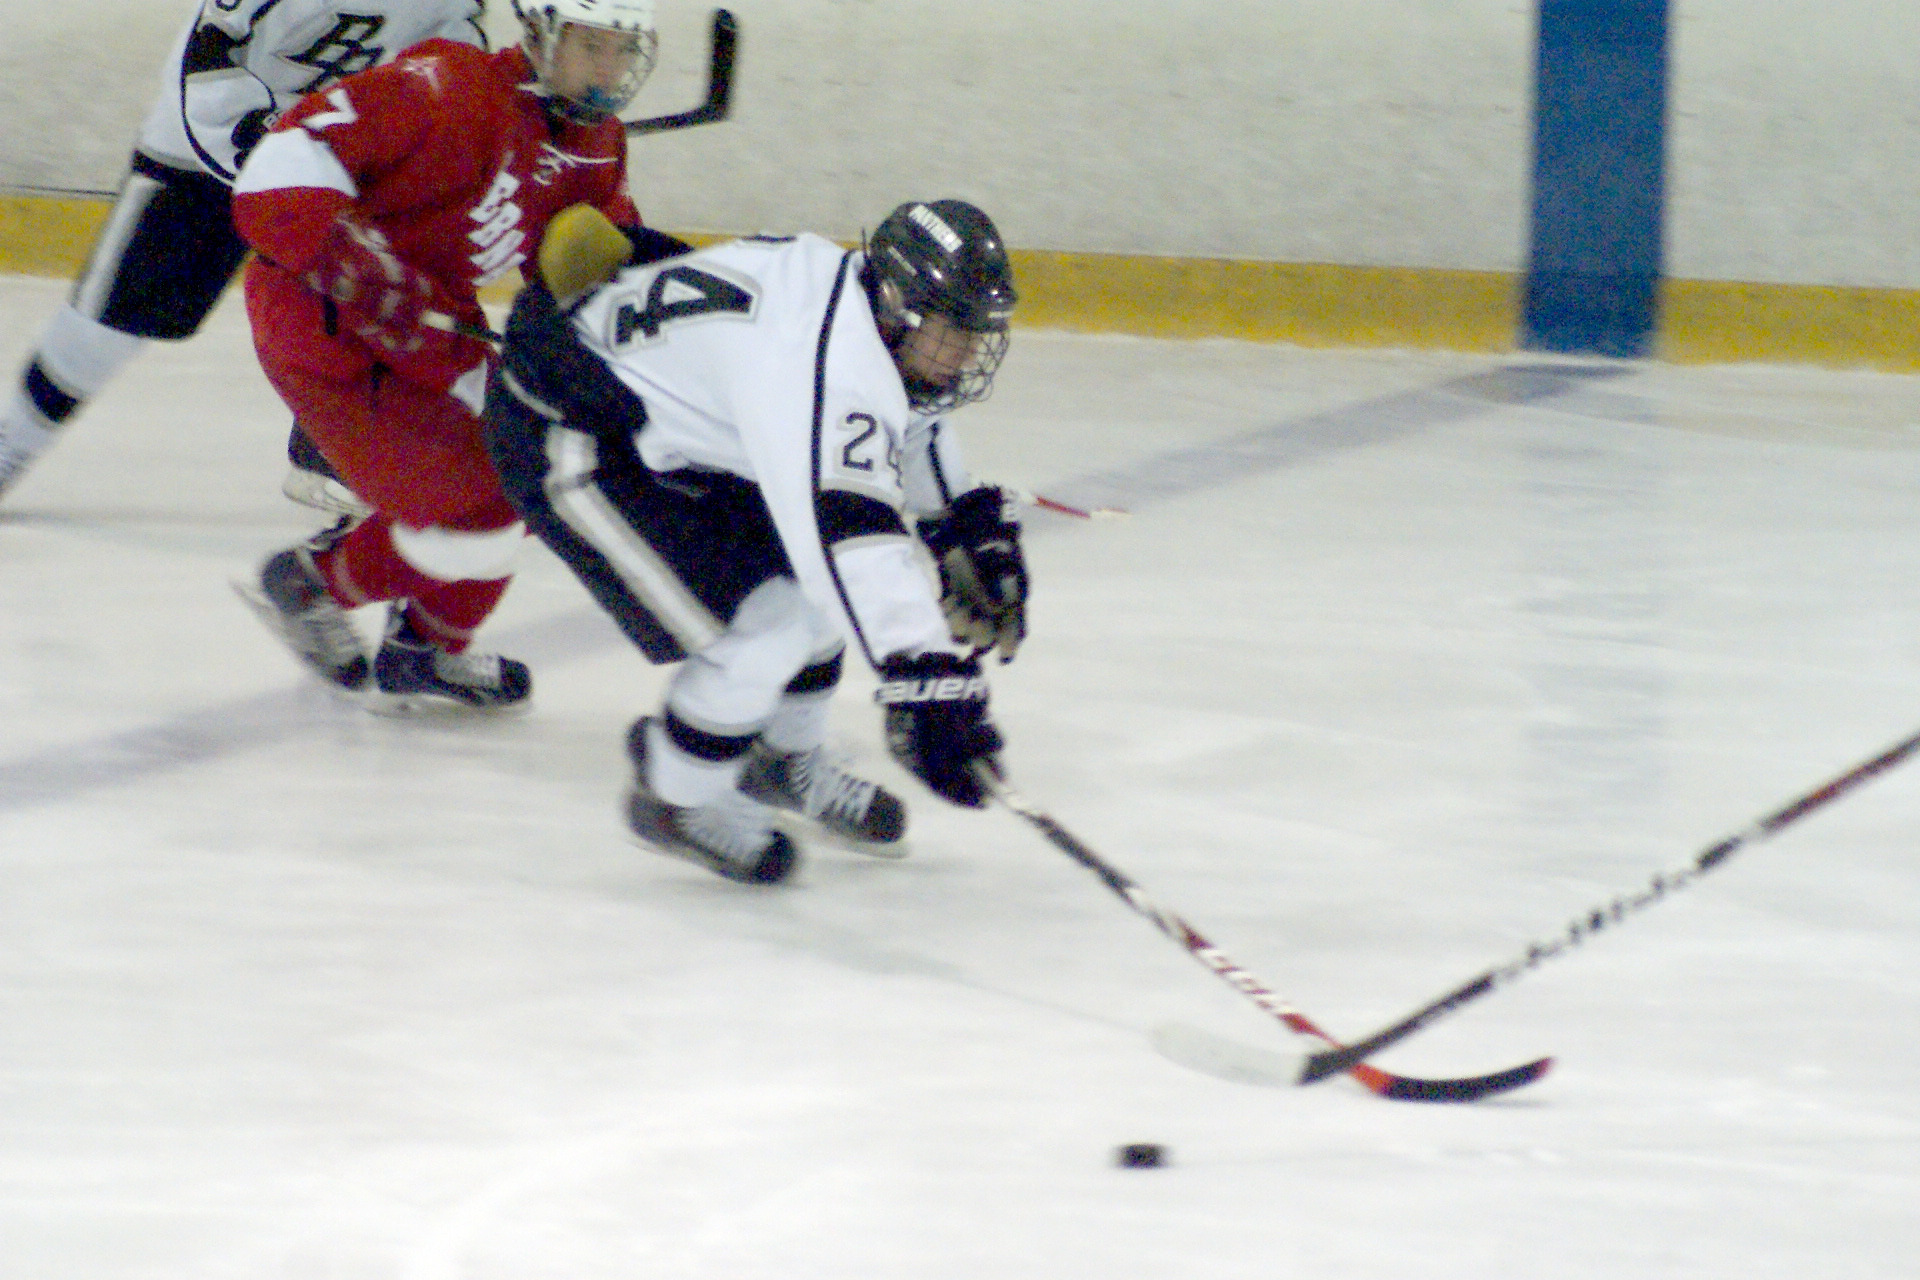 d35f21b83d8d1eb3baf1_Ice_Hockey_15.JPG